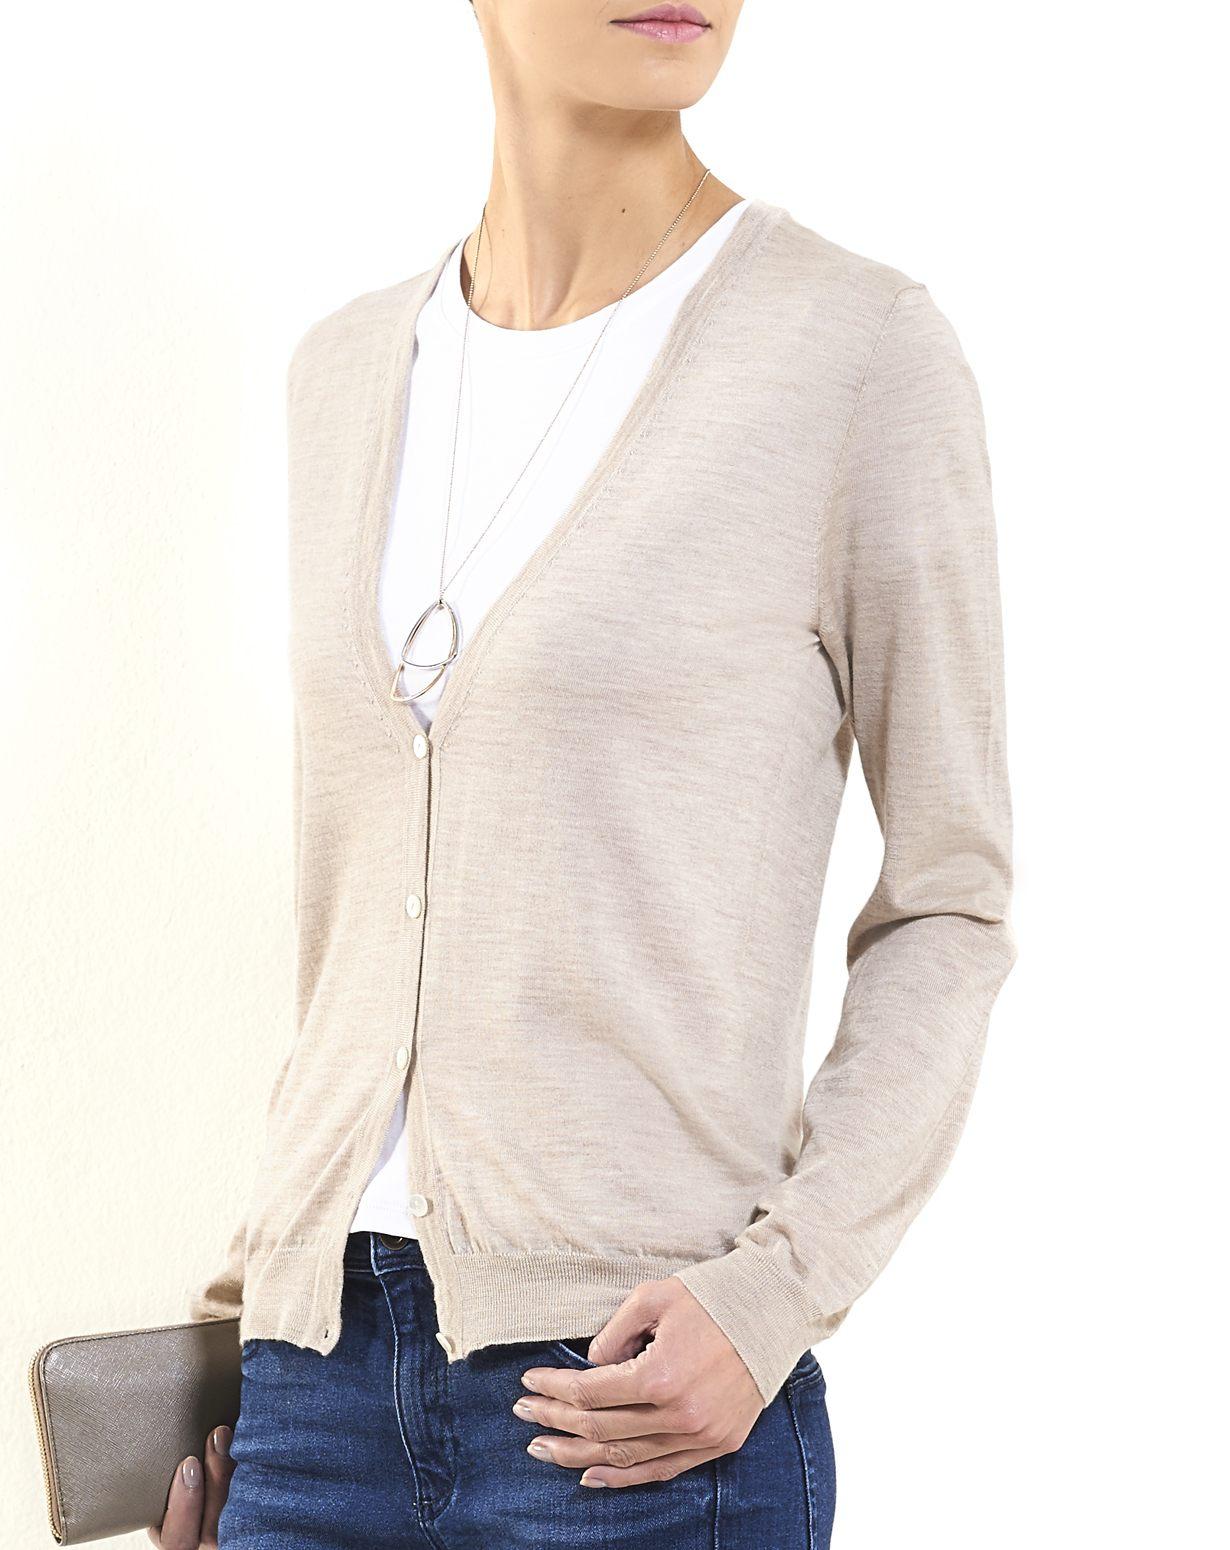 Ladies' Silk Cashmere V-Neck Cardigan